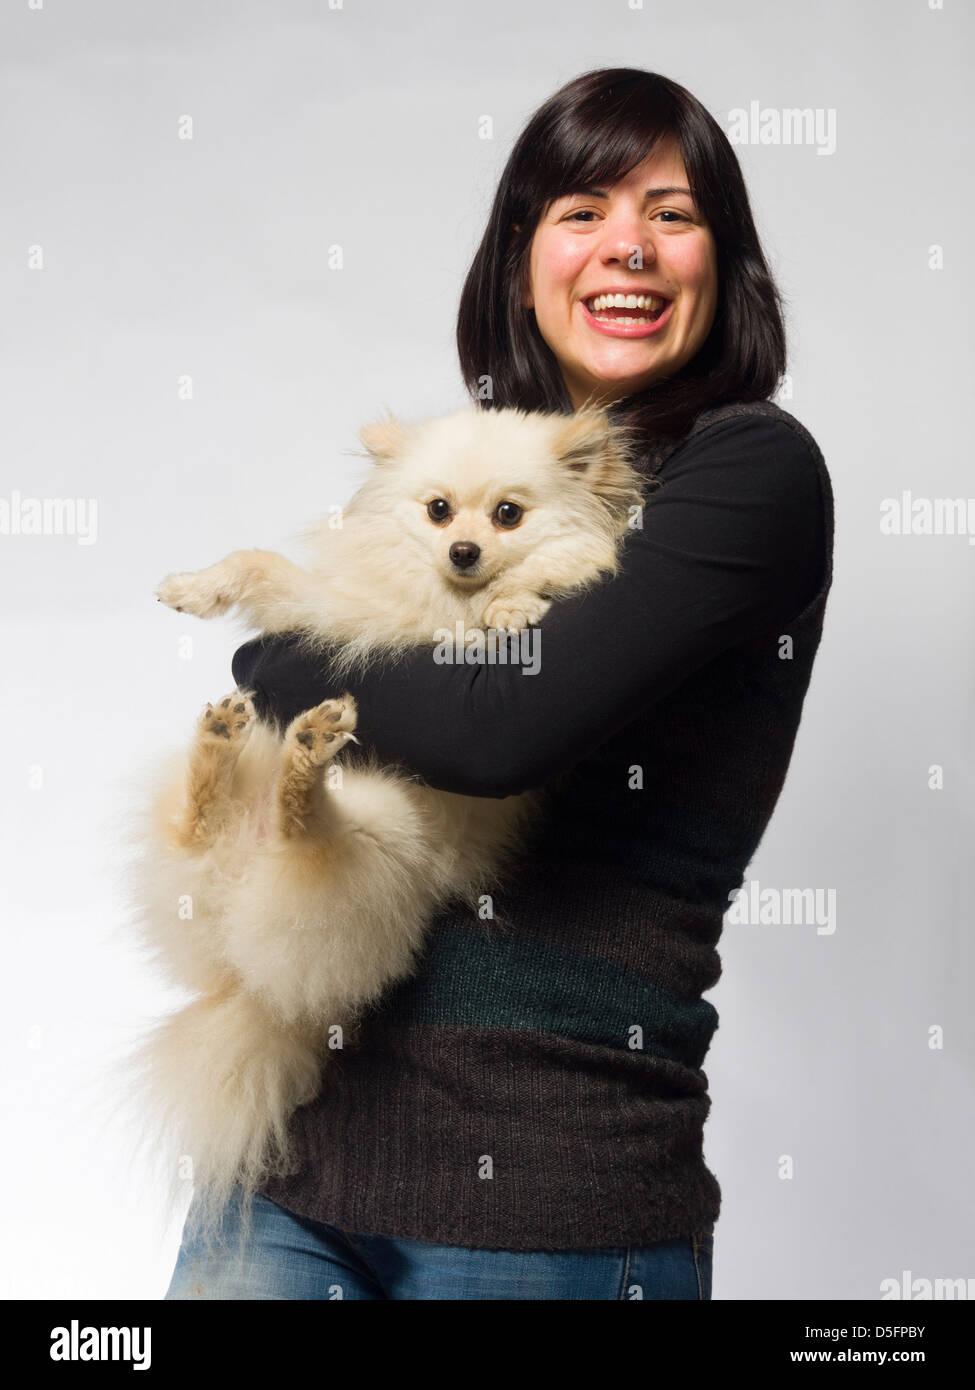 Woman Holding Small White Pomeranian Dog Stock Photo 55051247 Alamy